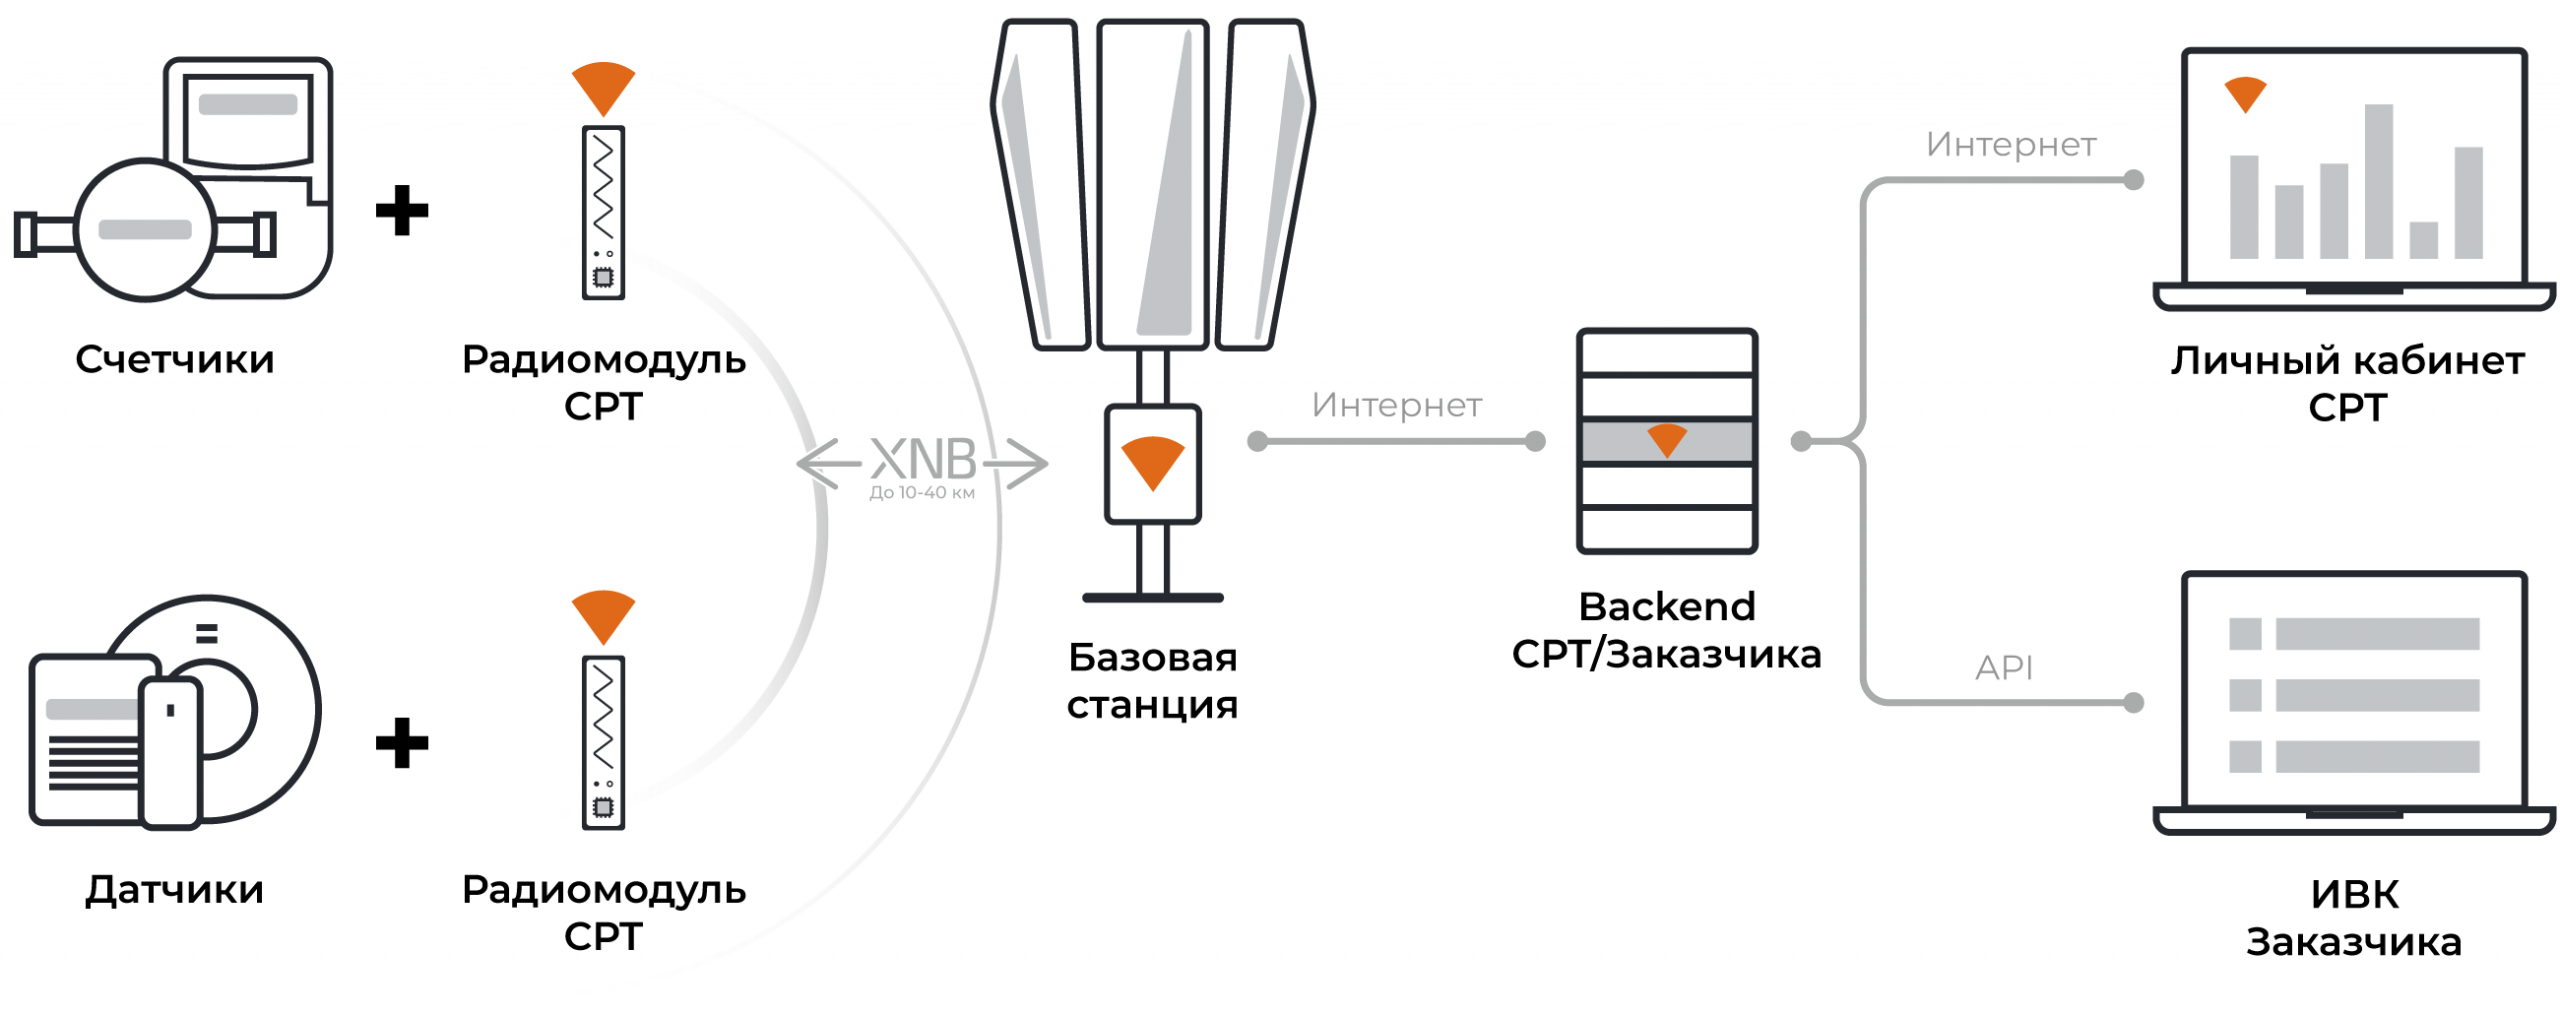 Схема-интеграции2